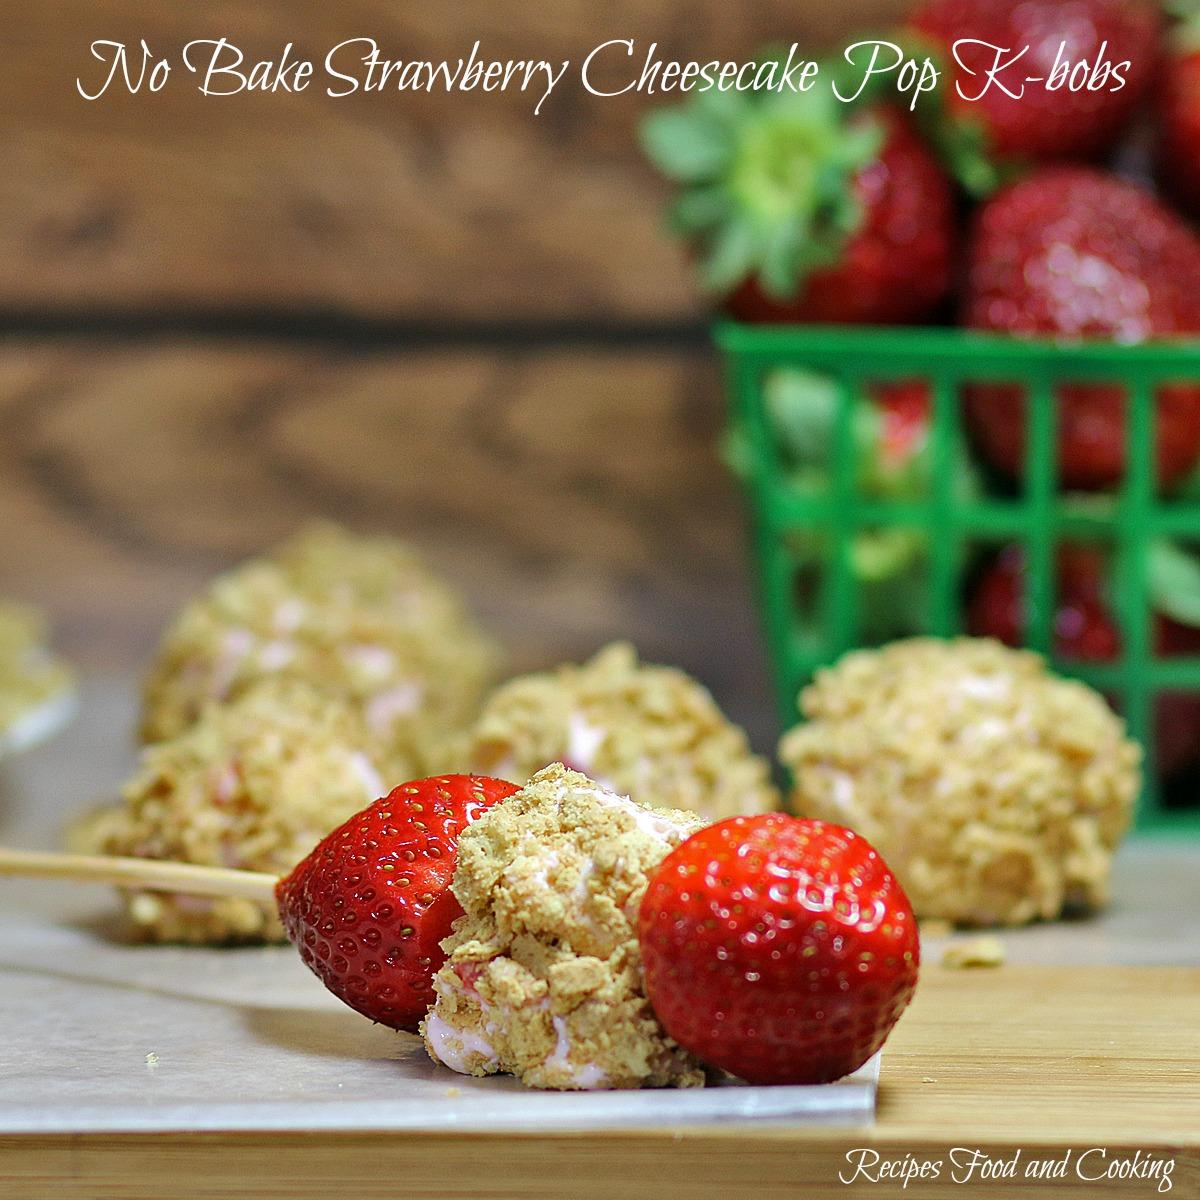 No Bake Strawberry Cheesecake Pop K-bobs